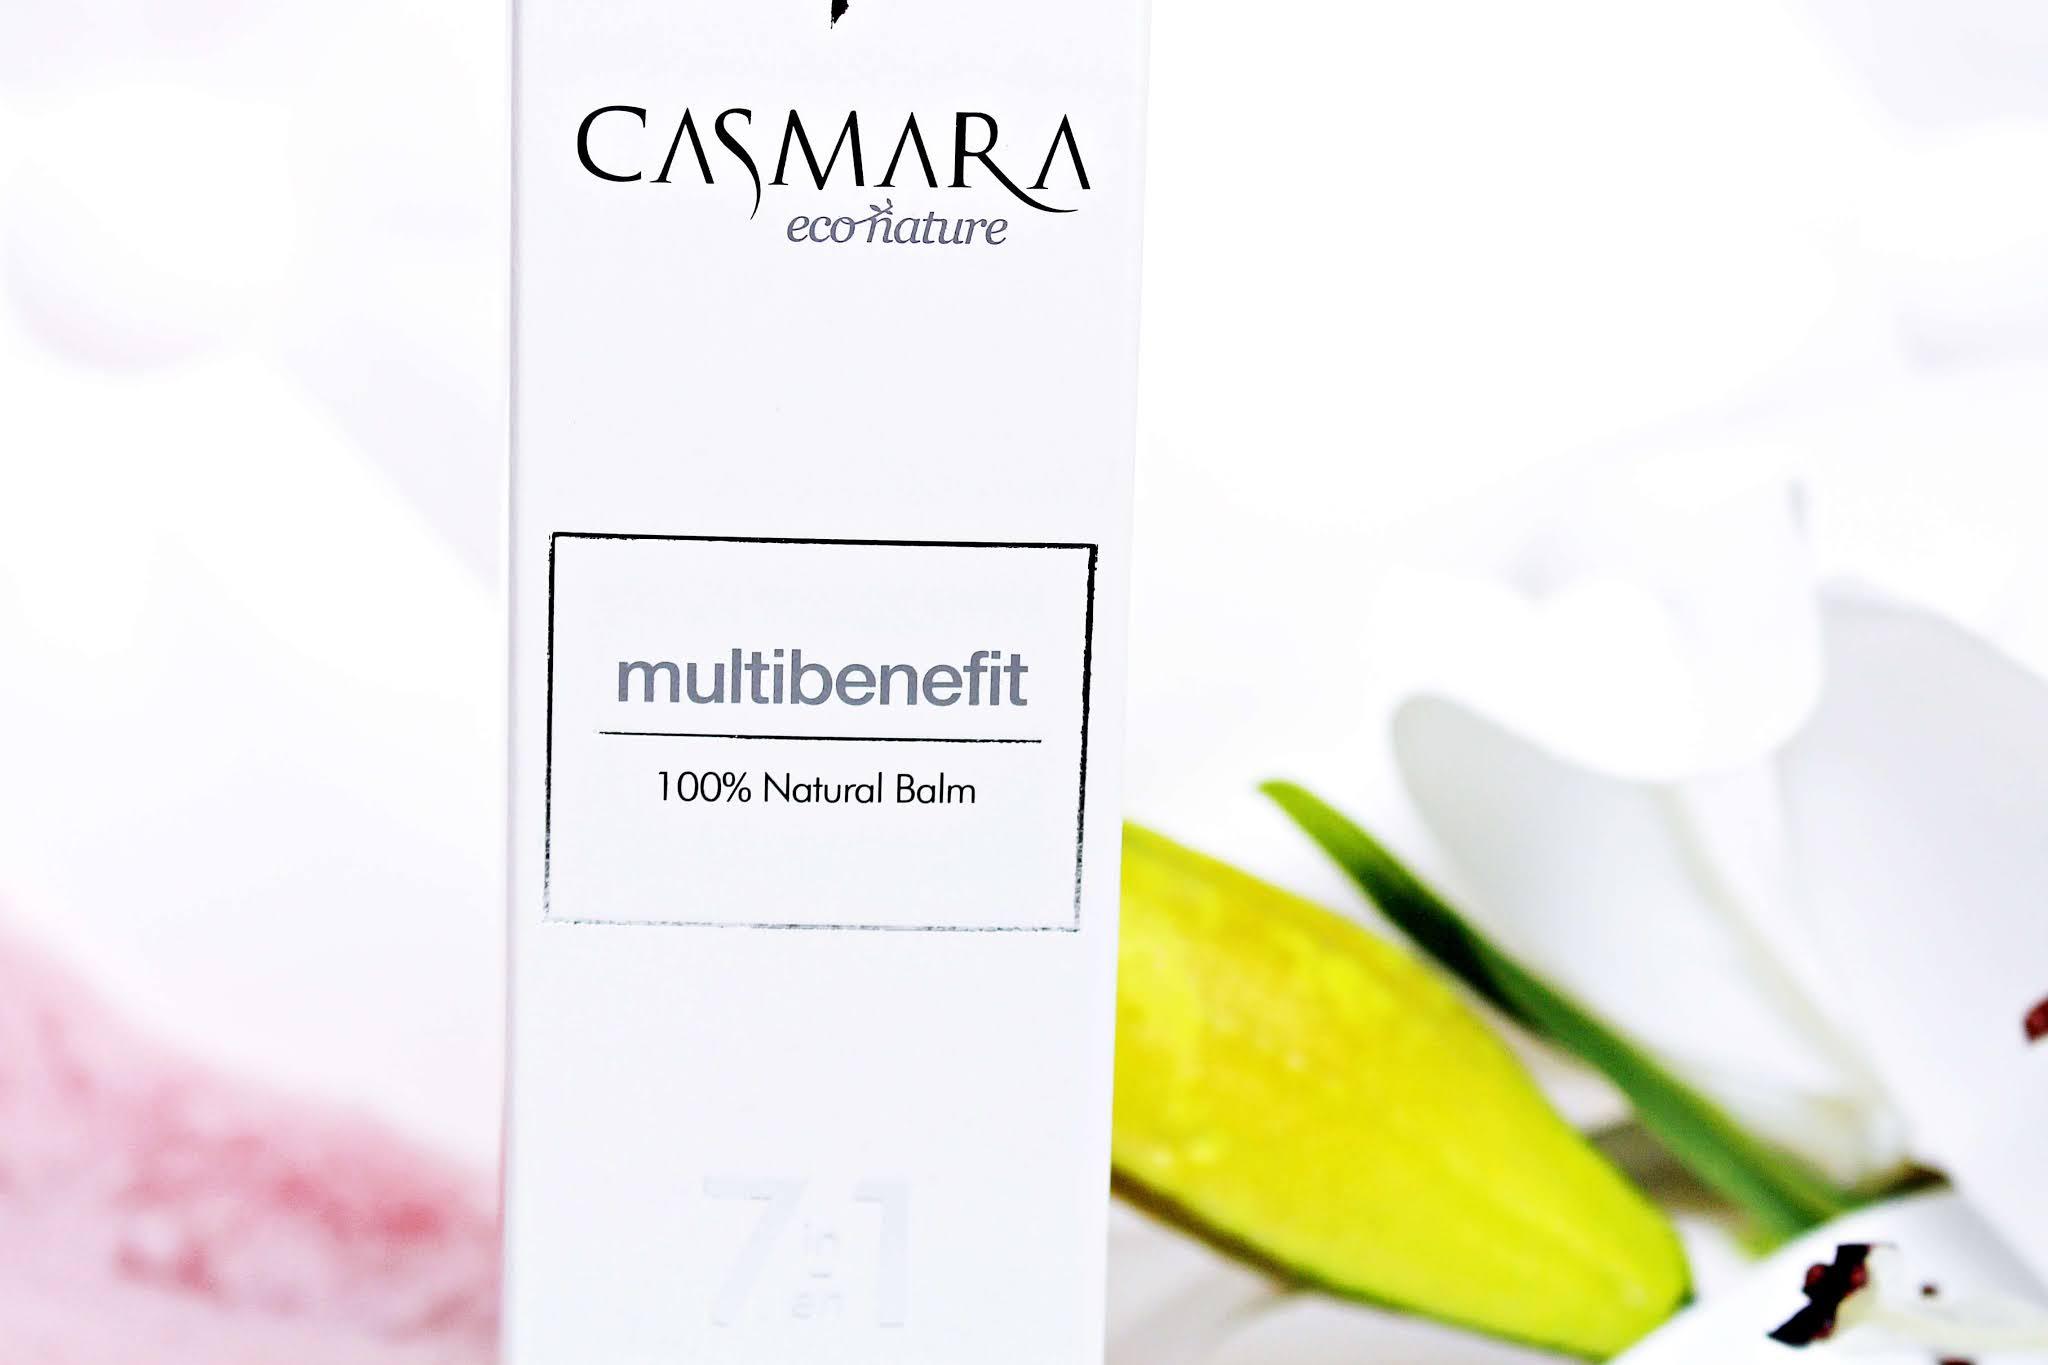 Casmara Balsam Multibenefit 7w1